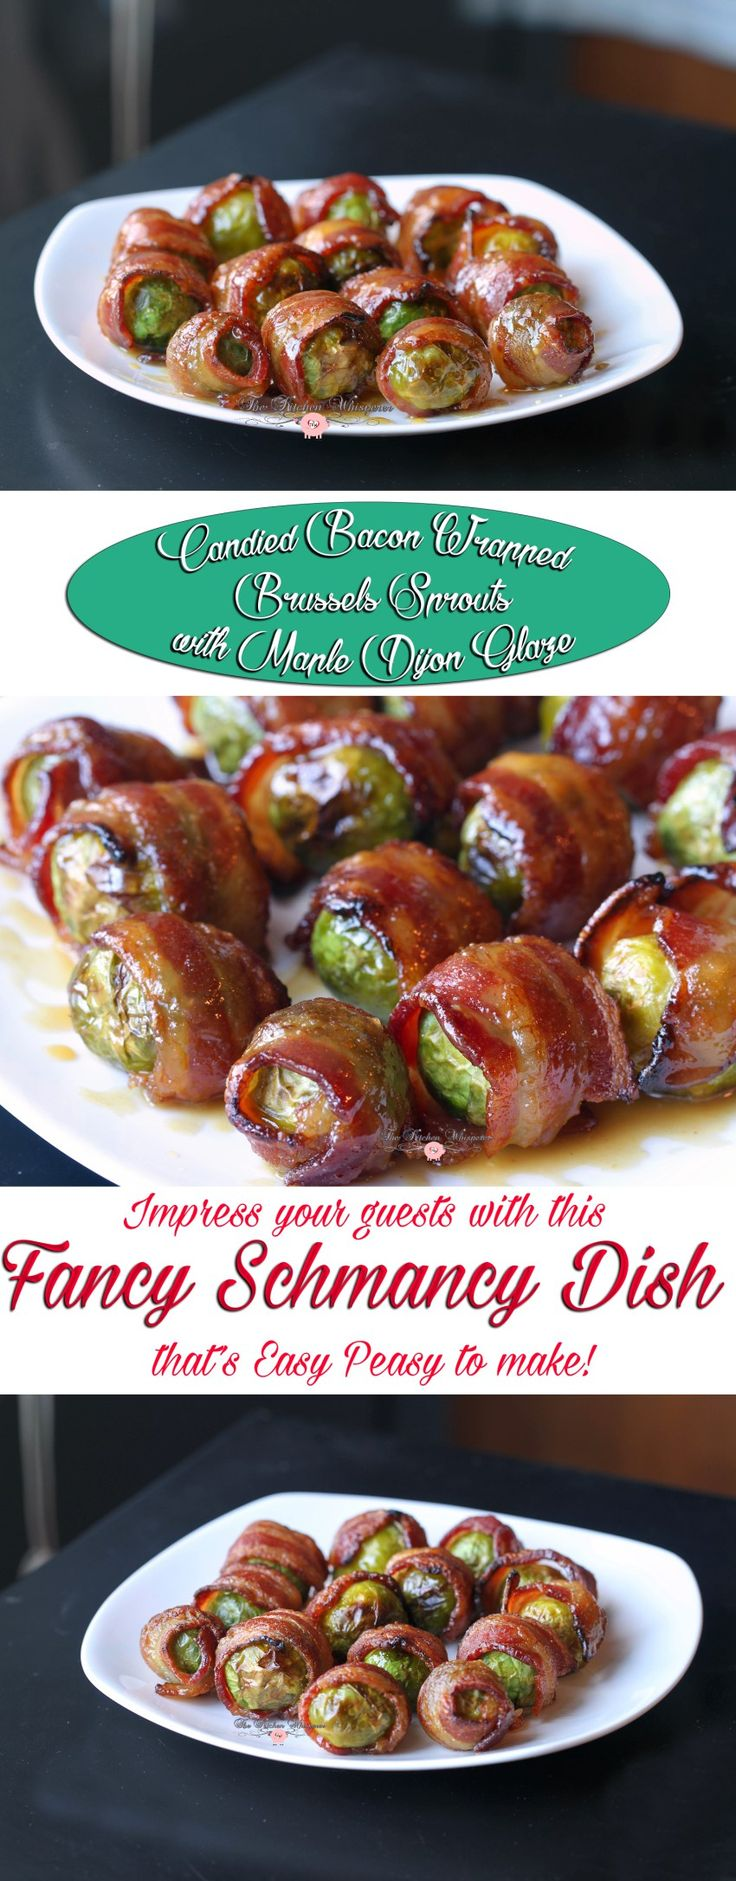 Top 25+ Best Fancy Dinner Recipes Ideas On Pinterest  Shrimp Dishes,  Garlic Shrimp Pasta And Garlic Prawns